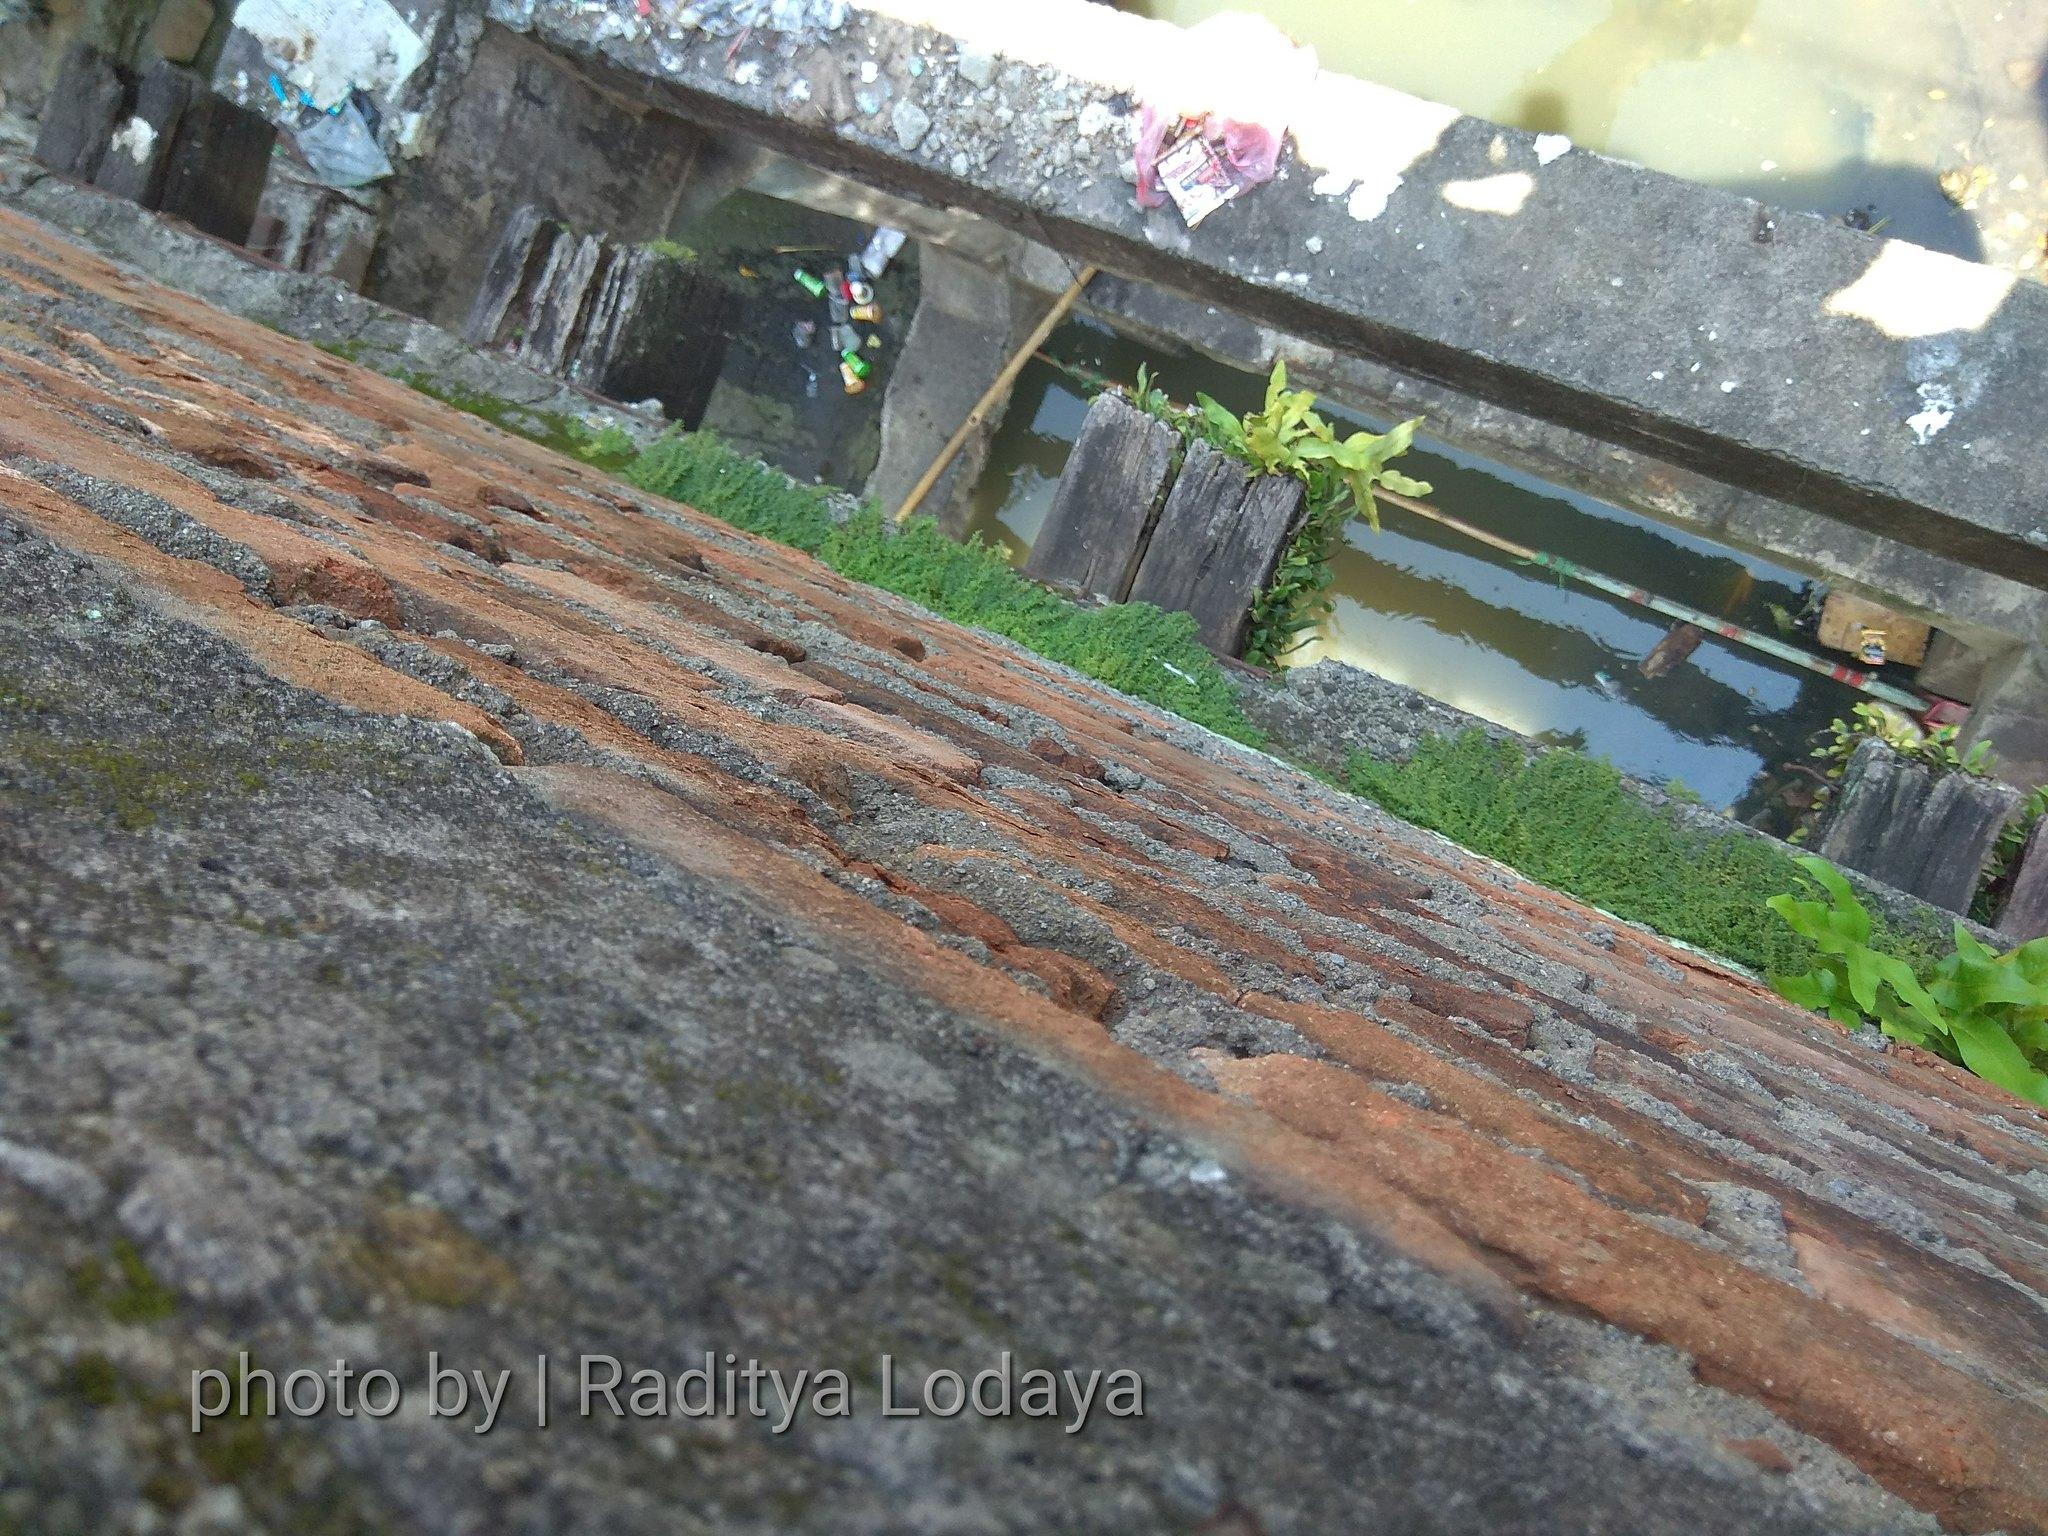 Foto Jalur Rel Mati Bandung (Kiaracondong Karees) 37 - Bantalan kayu di bawah bekas jembatan kereta api